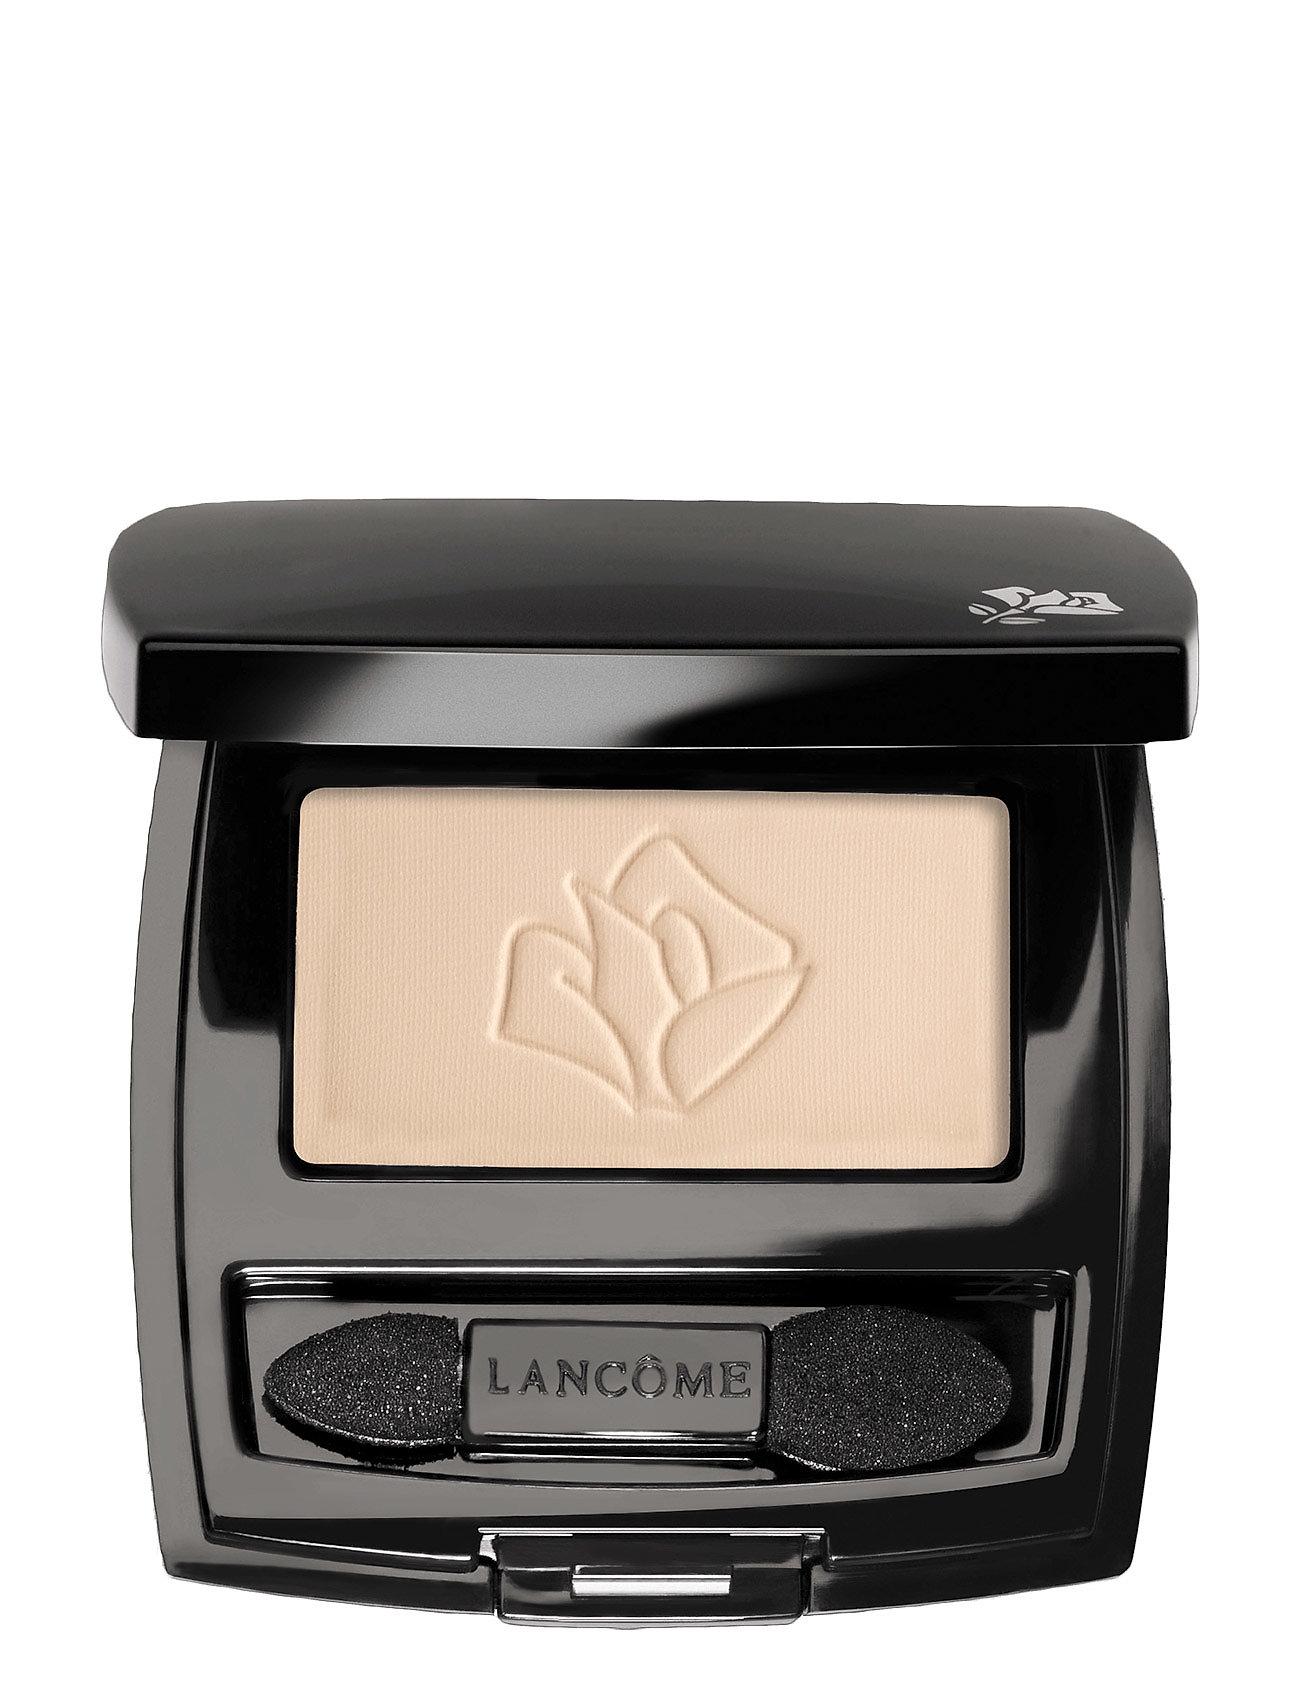 Image of Ombre HypnôSe Mono Eyeshadow Beauty WOMEN Makeup Eyes Eyeshadows Eyeshadow - Not Palettes Beige Lancôme (2604349945)